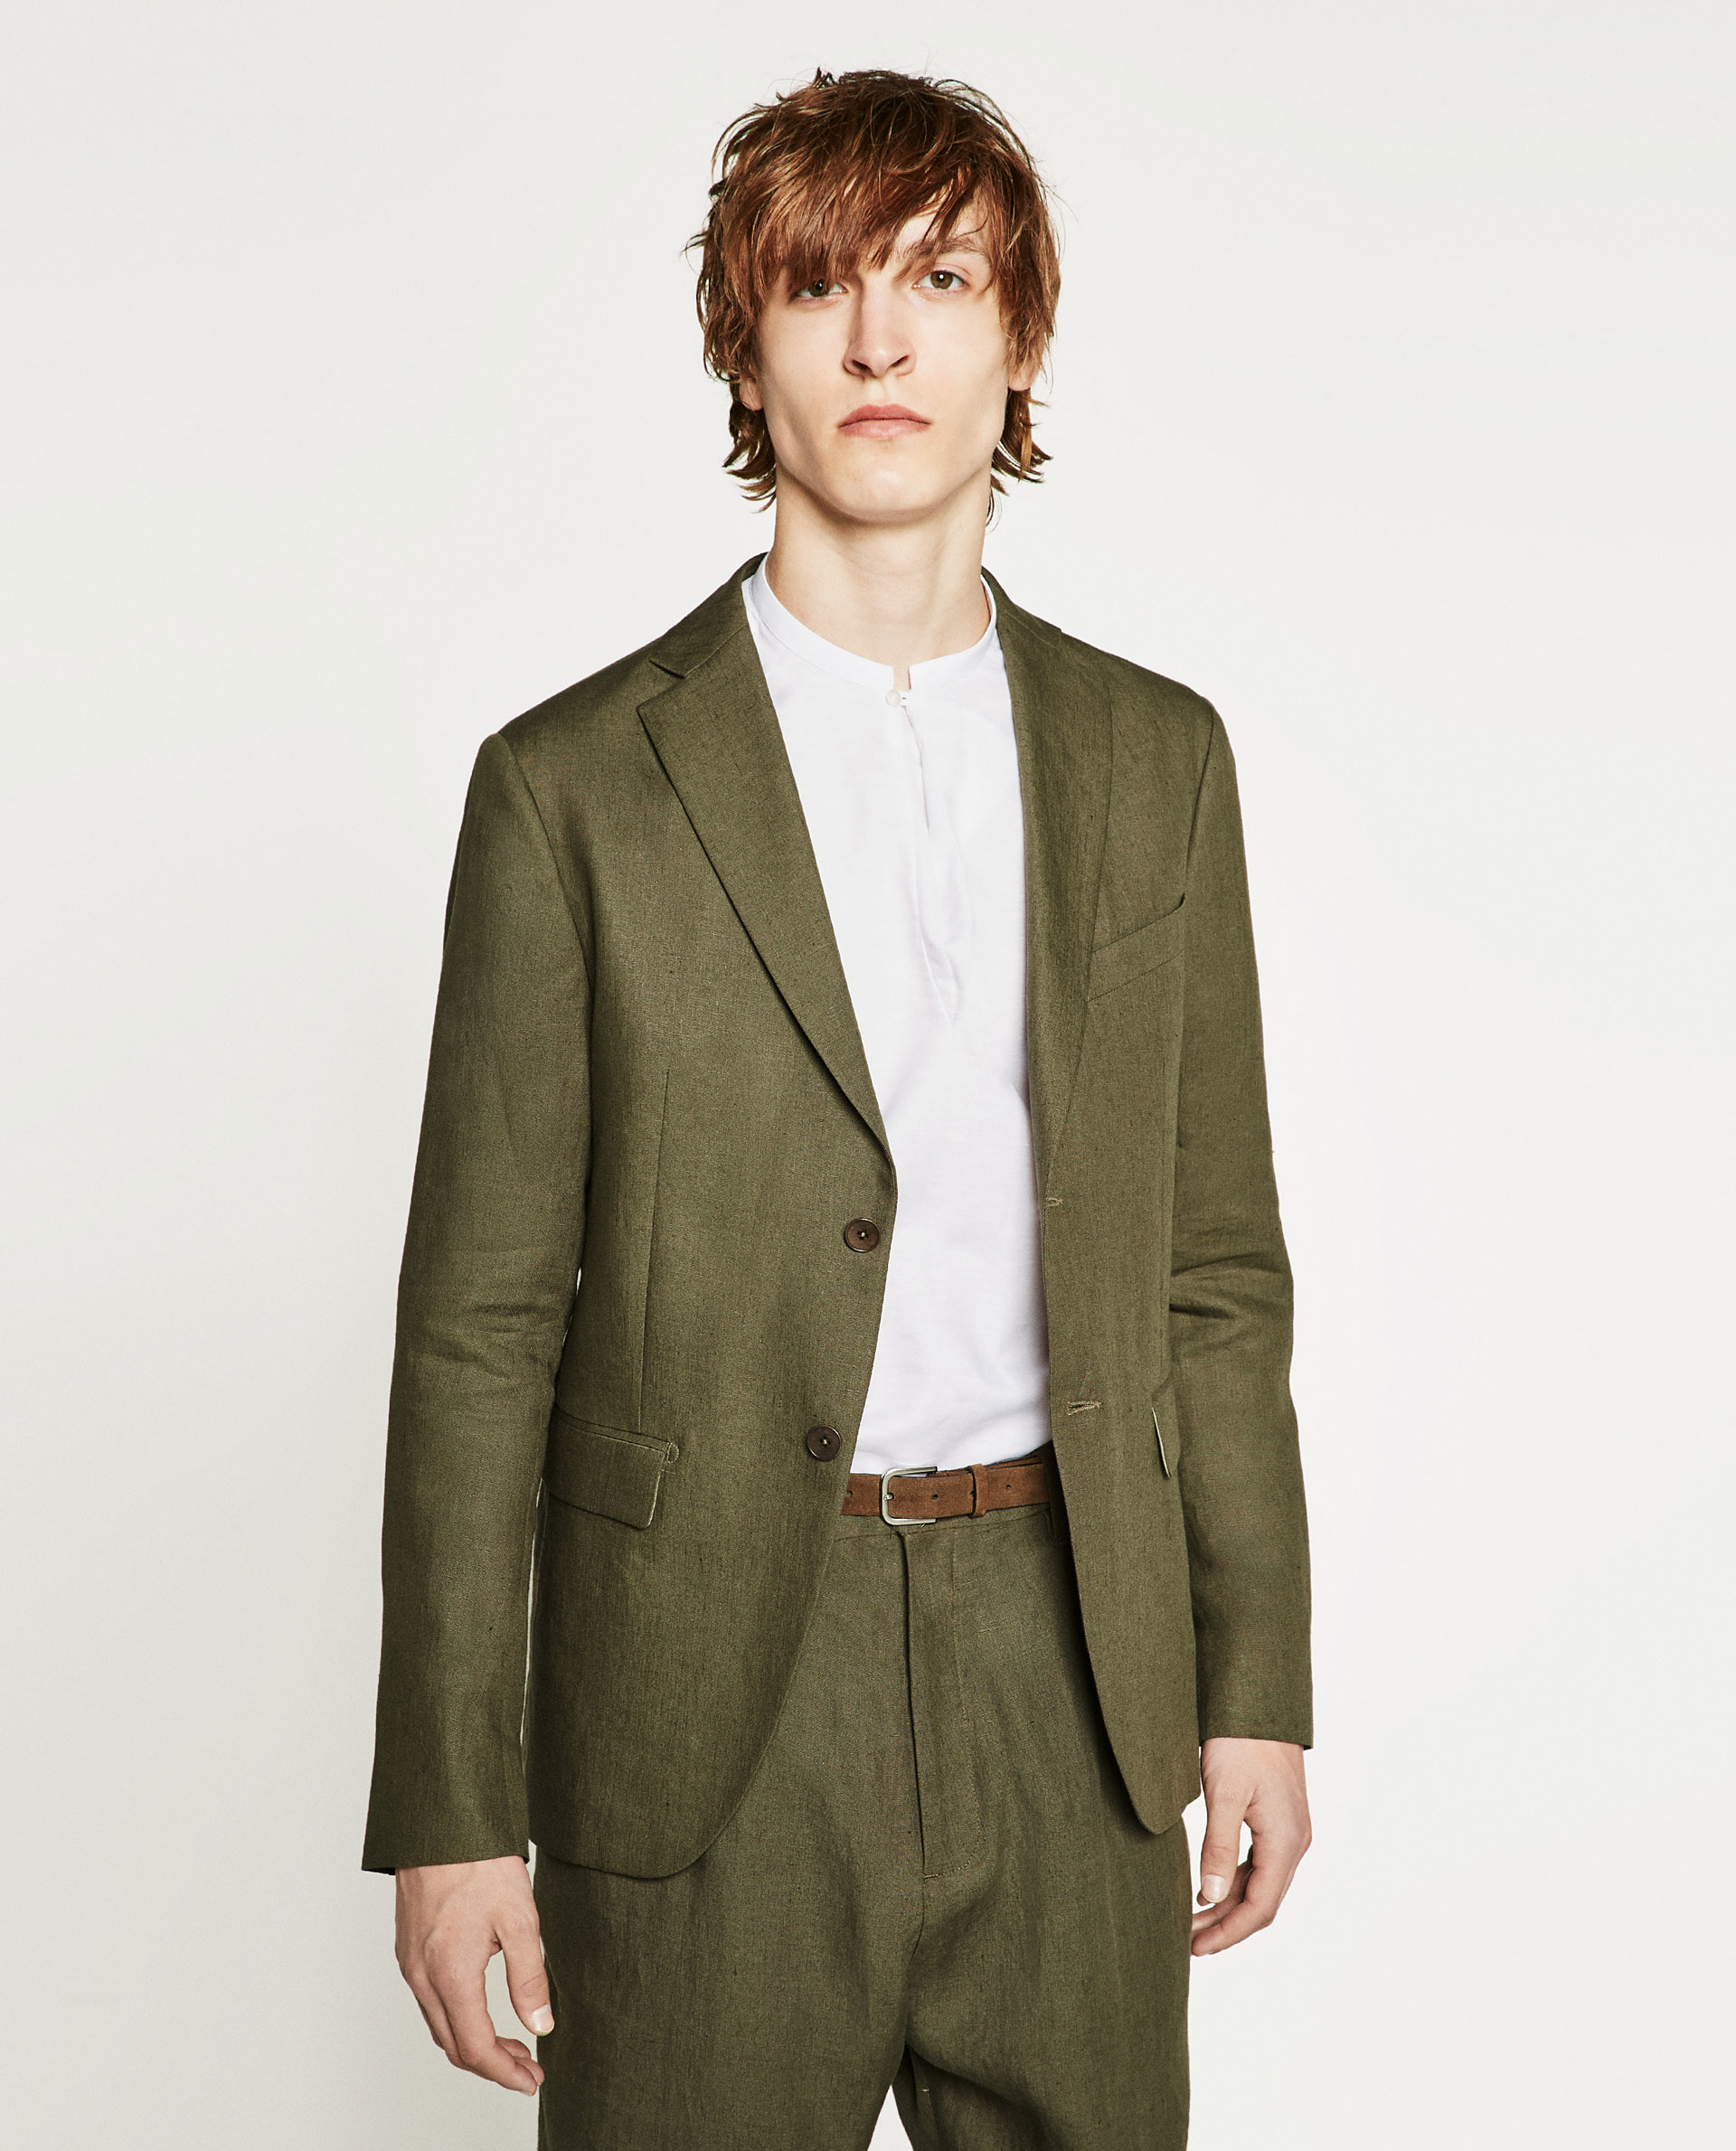 zara linen suit blazer in green for men lyst. Black Bedroom Furniture Sets. Home Design Ideas